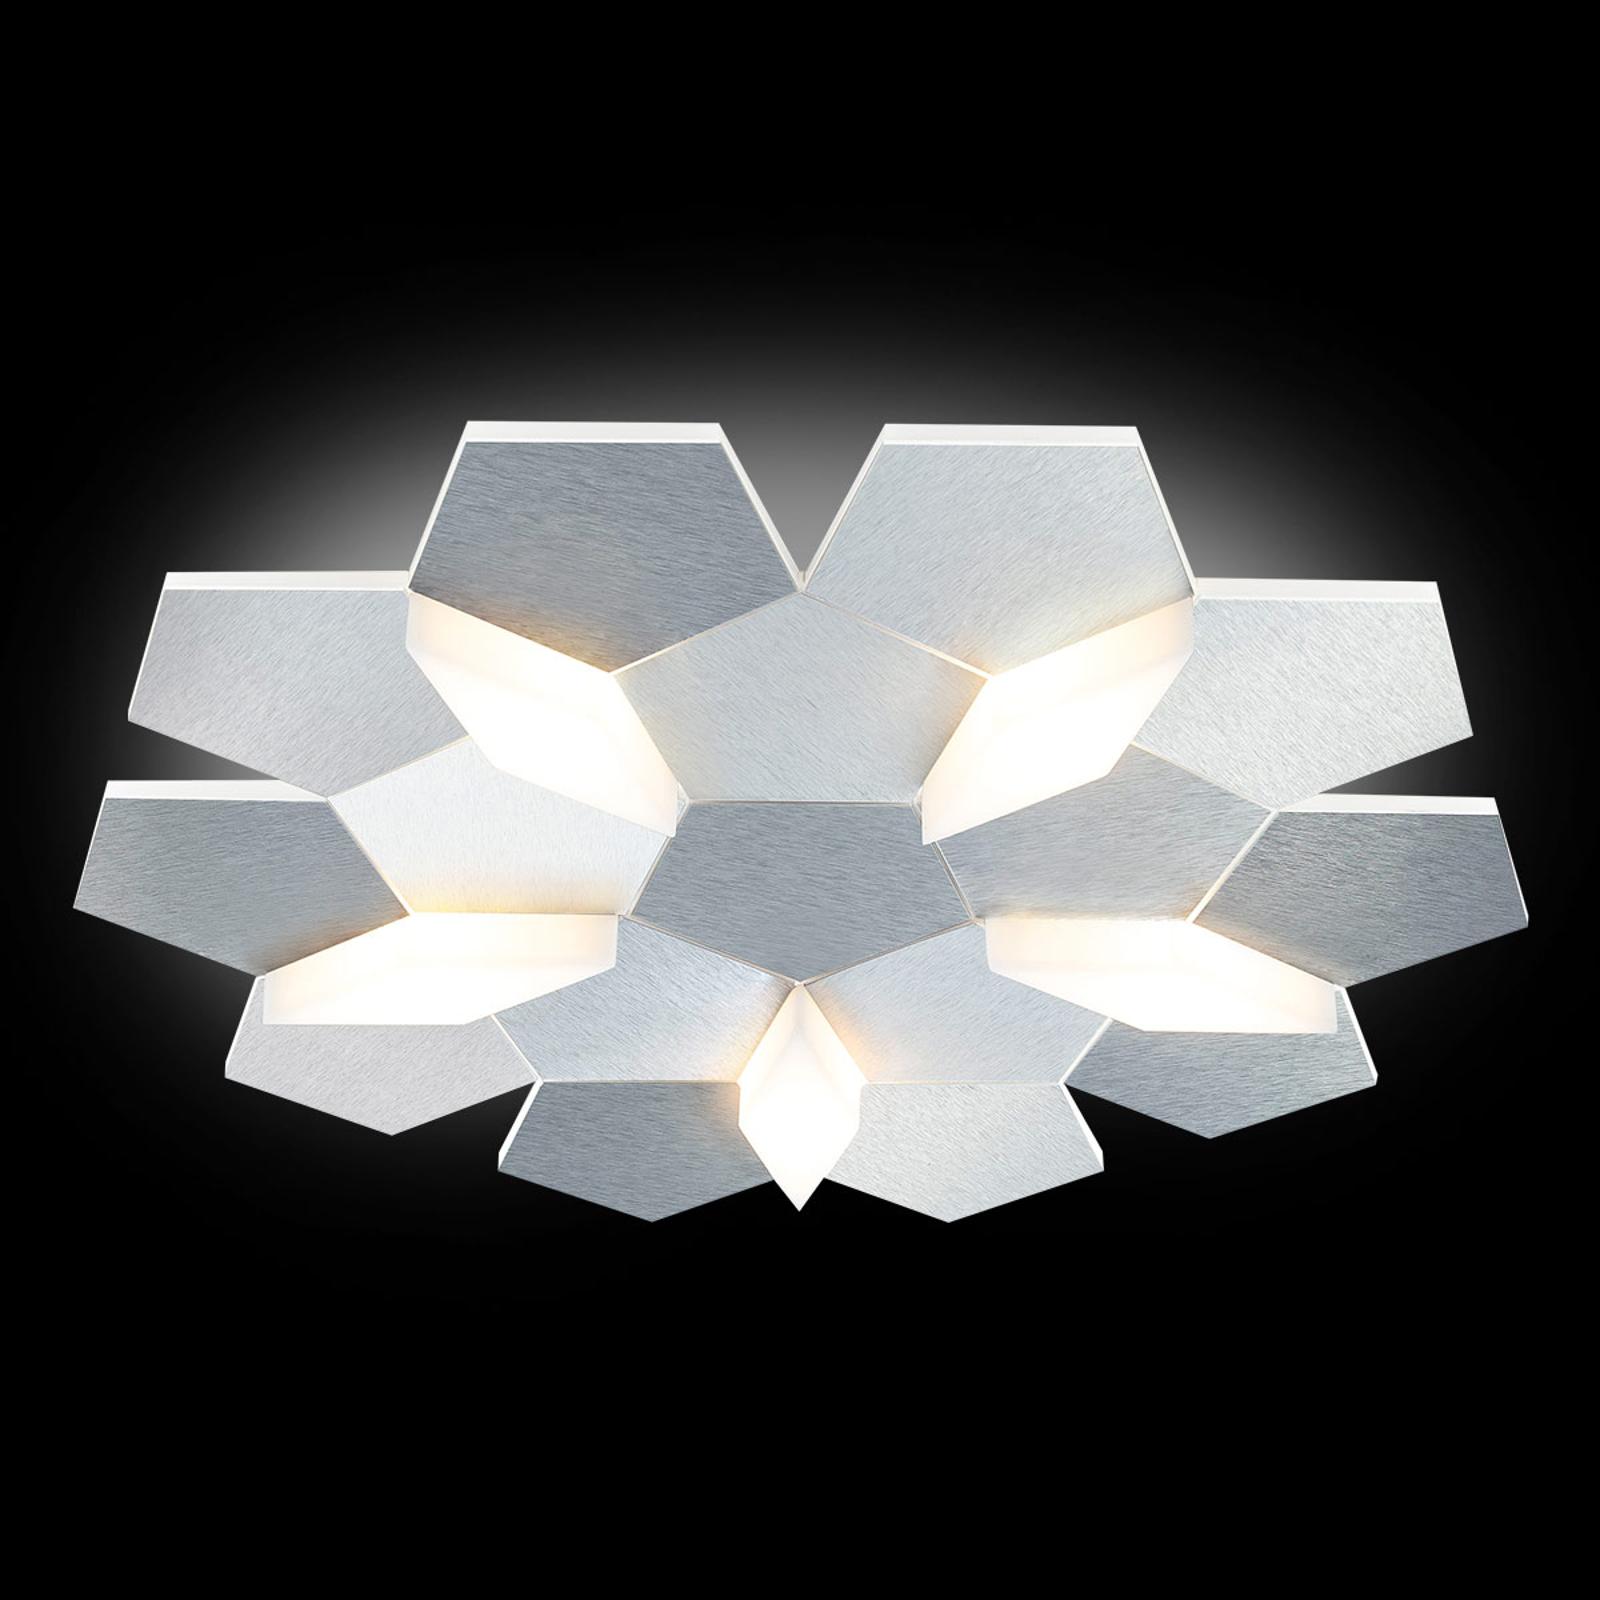 GROSSMANN Karat lampa sufitowa LED 5-punktowa